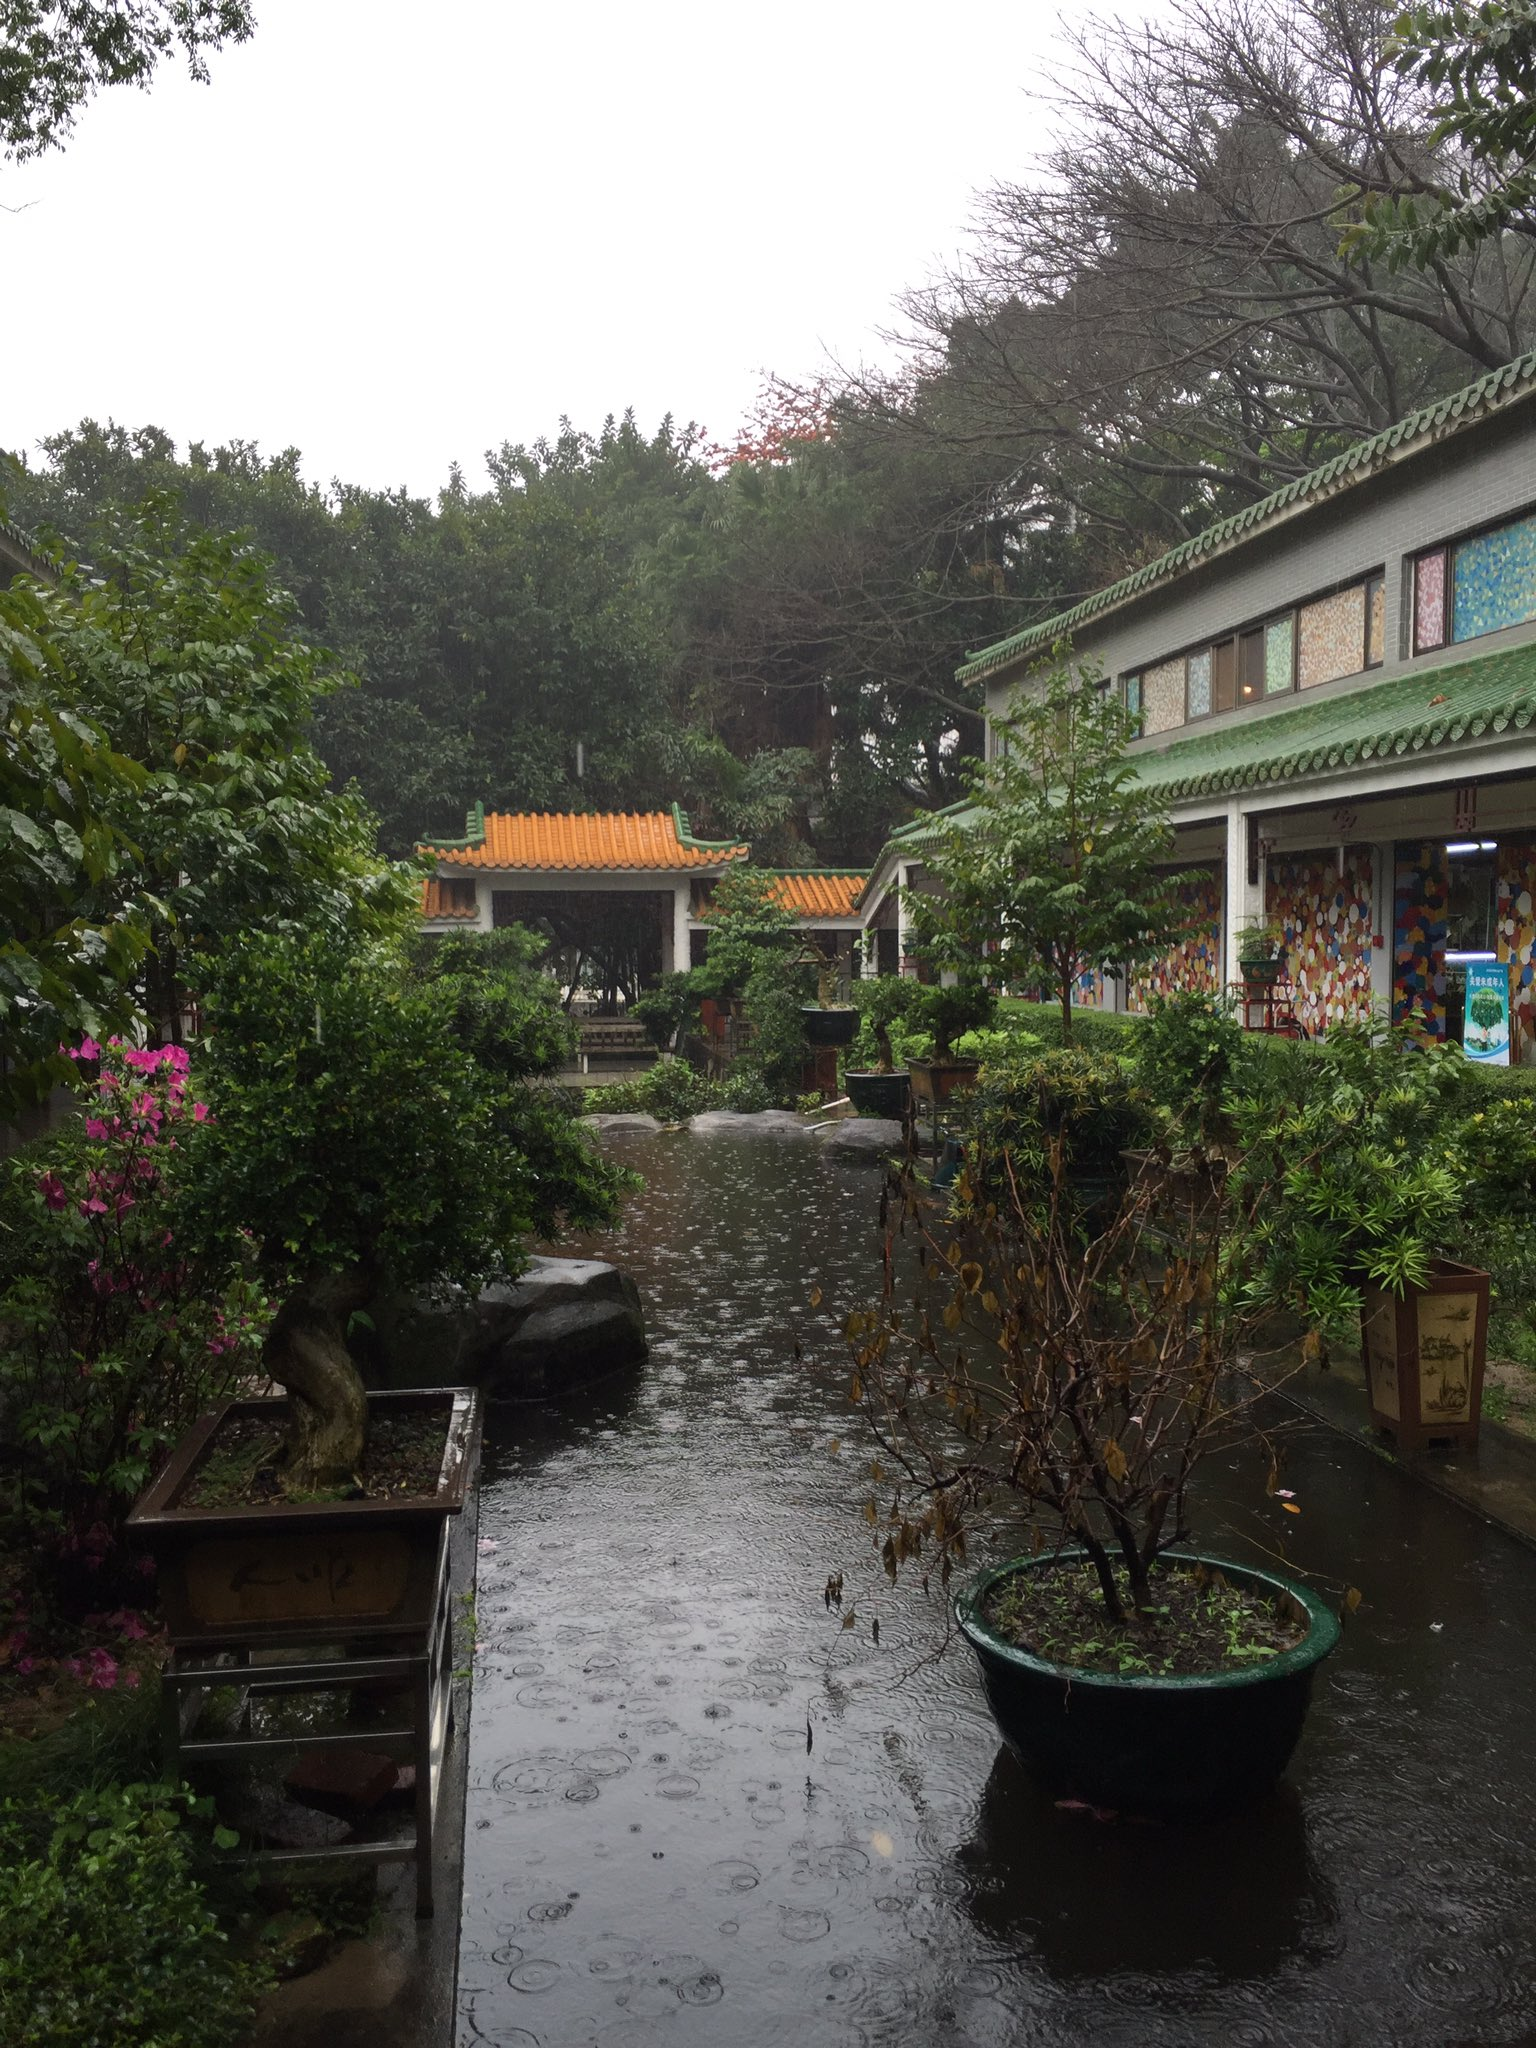 Enjoying the wonders of the Zhuhai Museum on a very rainy Sunday. https://t.co/XJP9CD4M6T